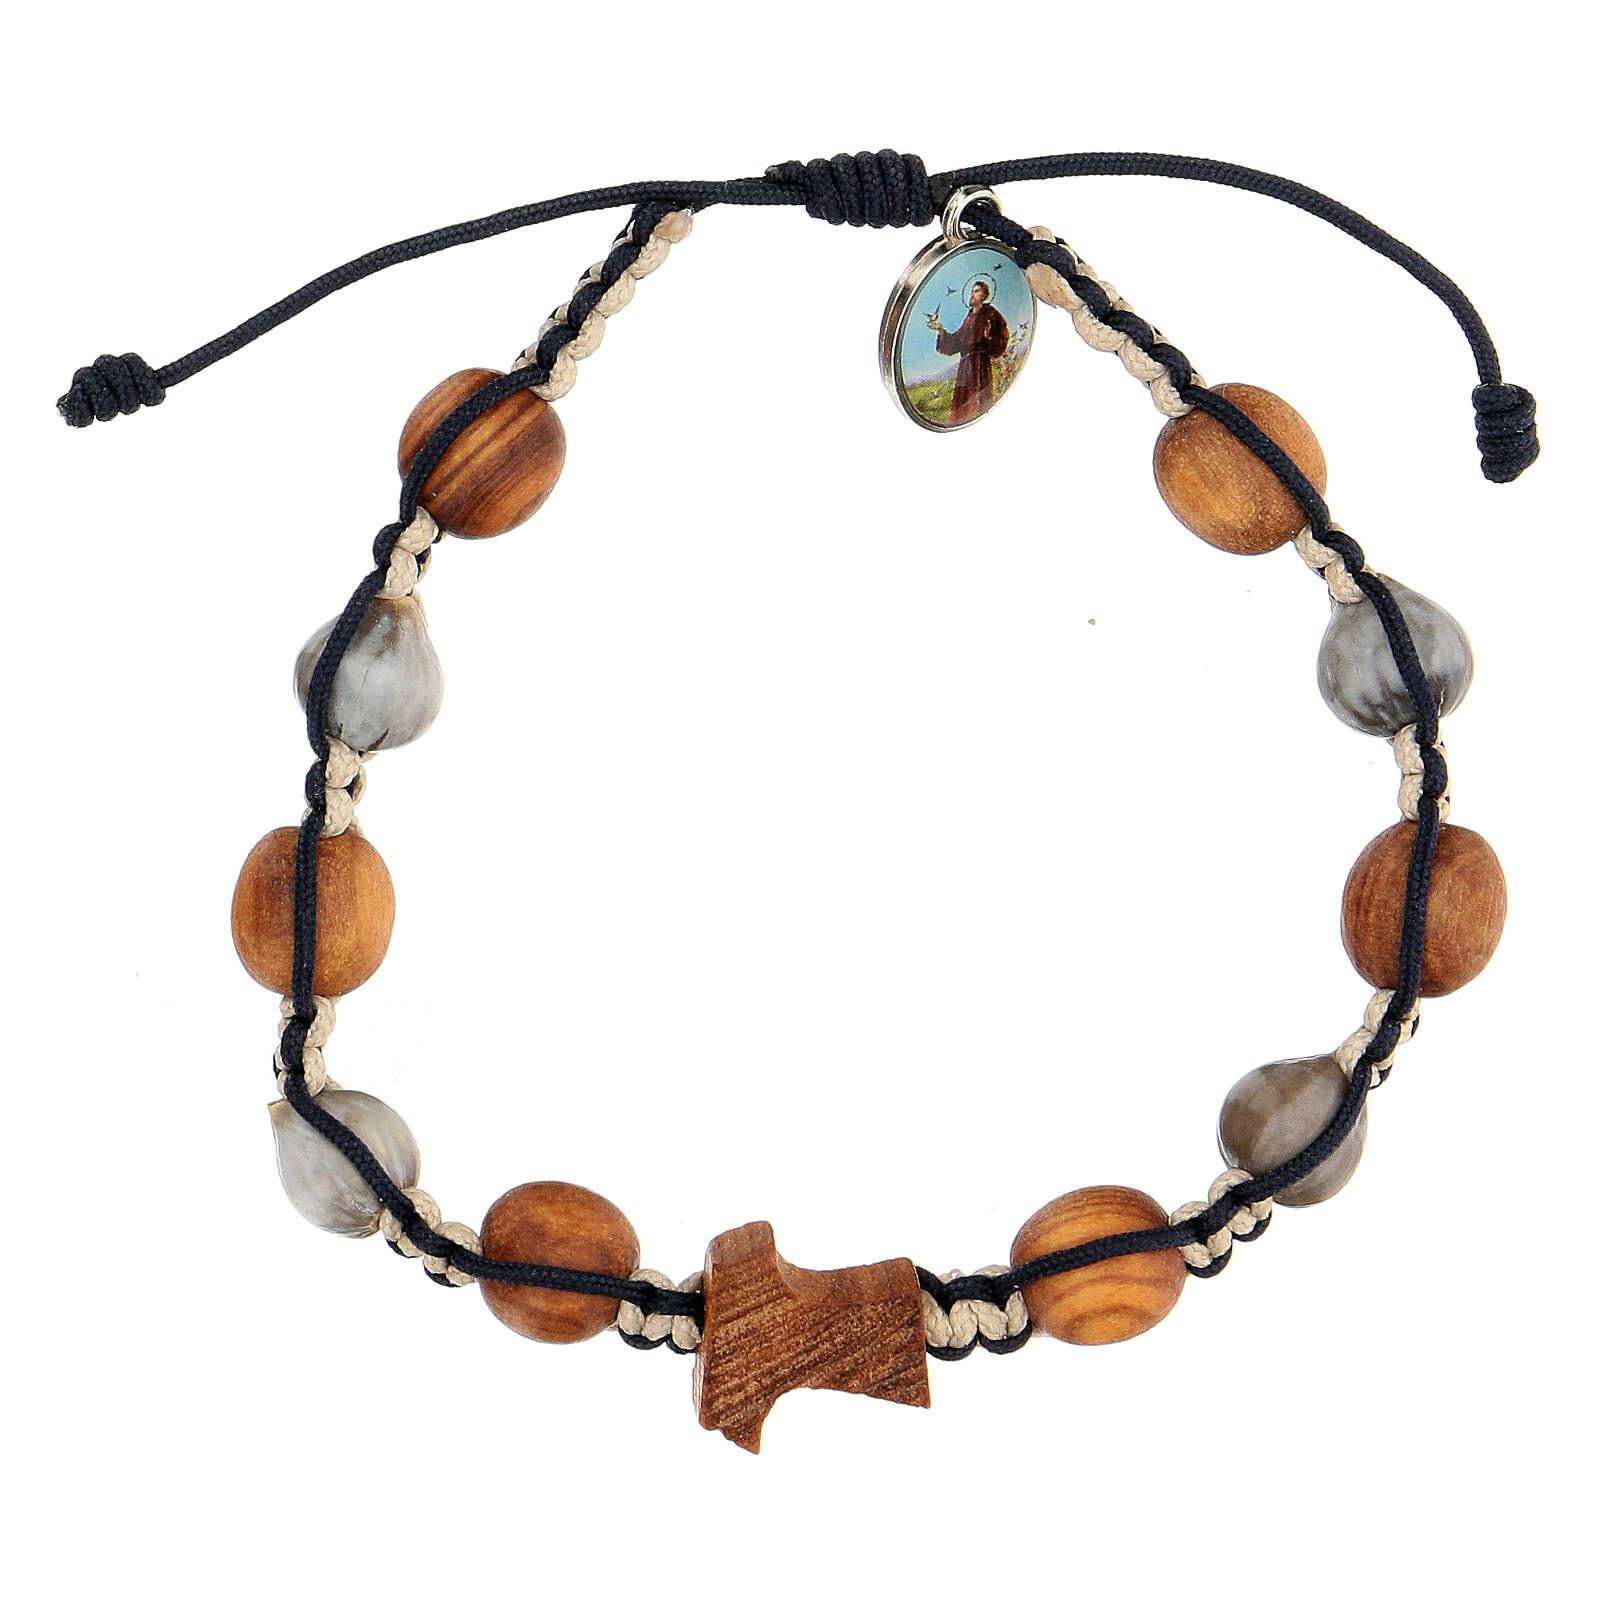 Bracciale Medjugorje medaglie croci ulivo corda bicolore tortora blu 4